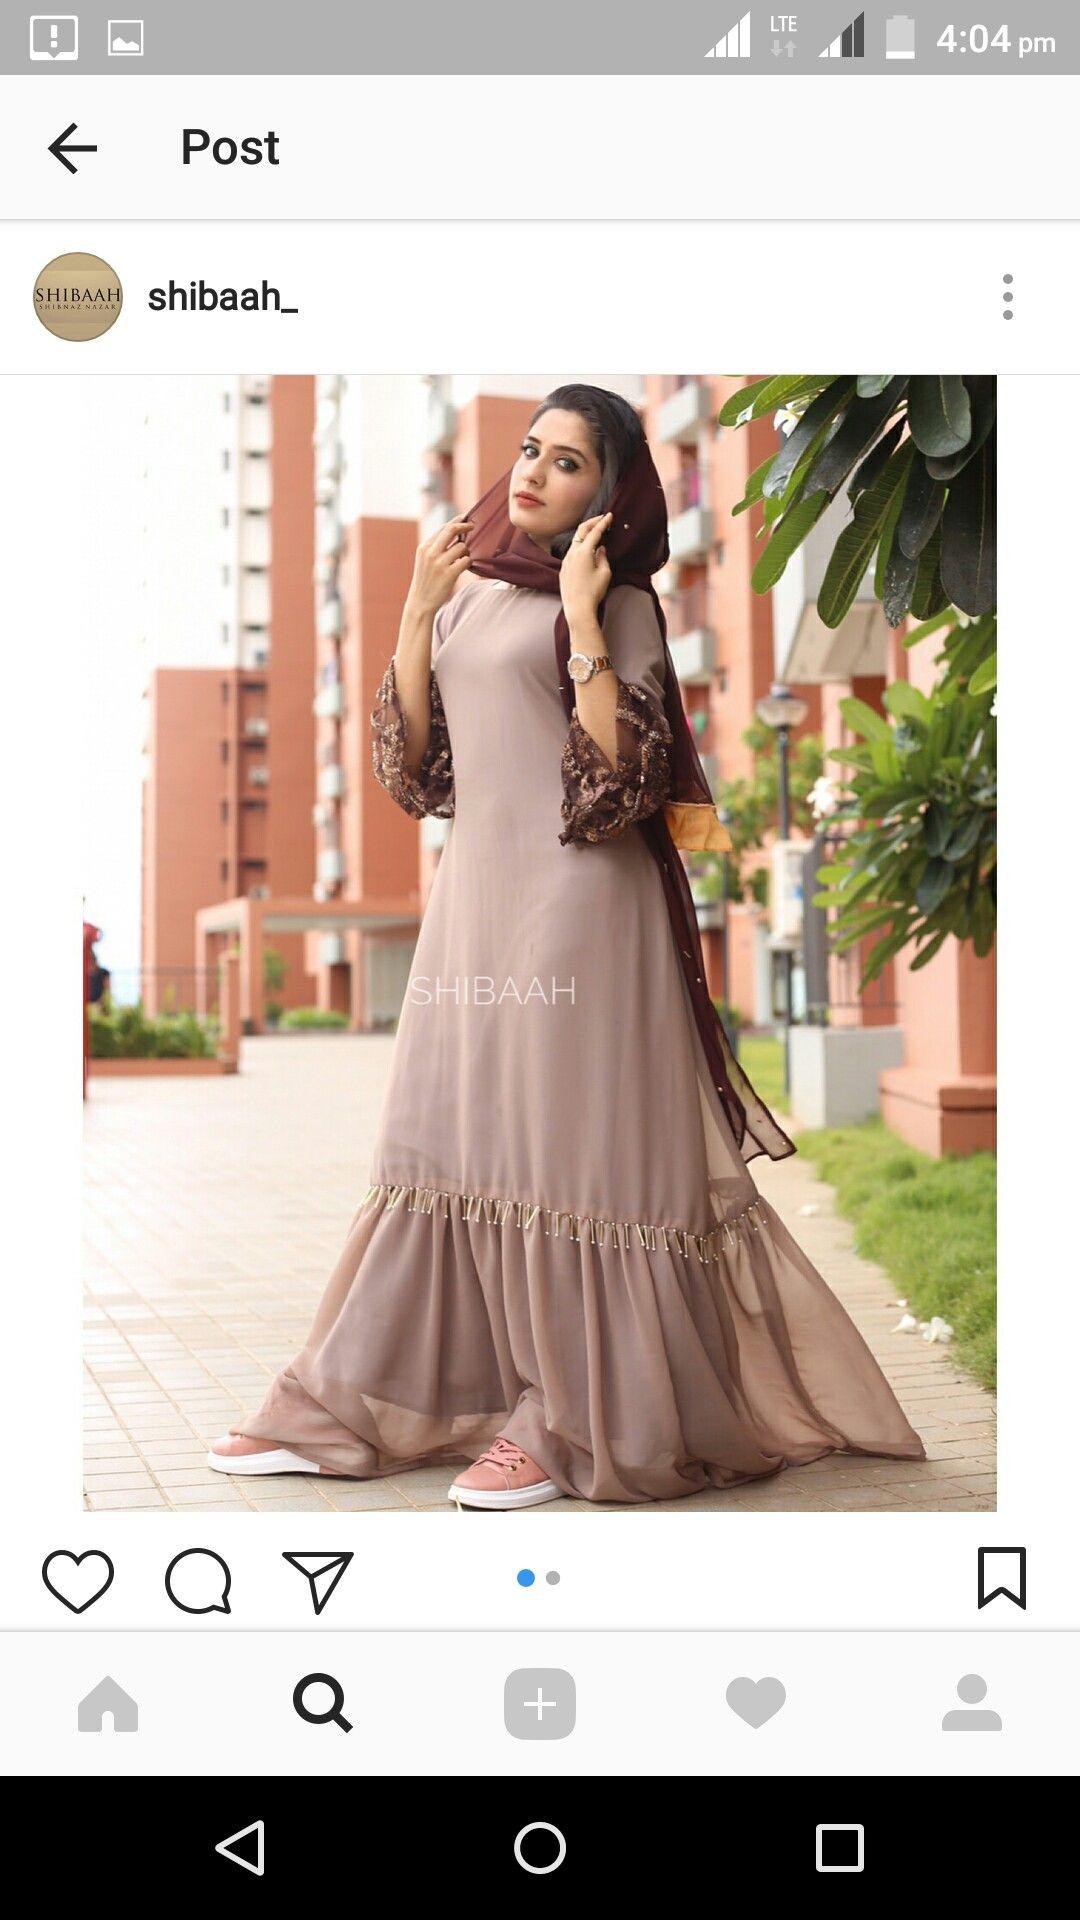 aac4aa4cc Muslim Dress, Hijab Dress, Hijab Outfit, Pakistani Casual Wear, Pakistani  Dresses,. Visit. June 2019